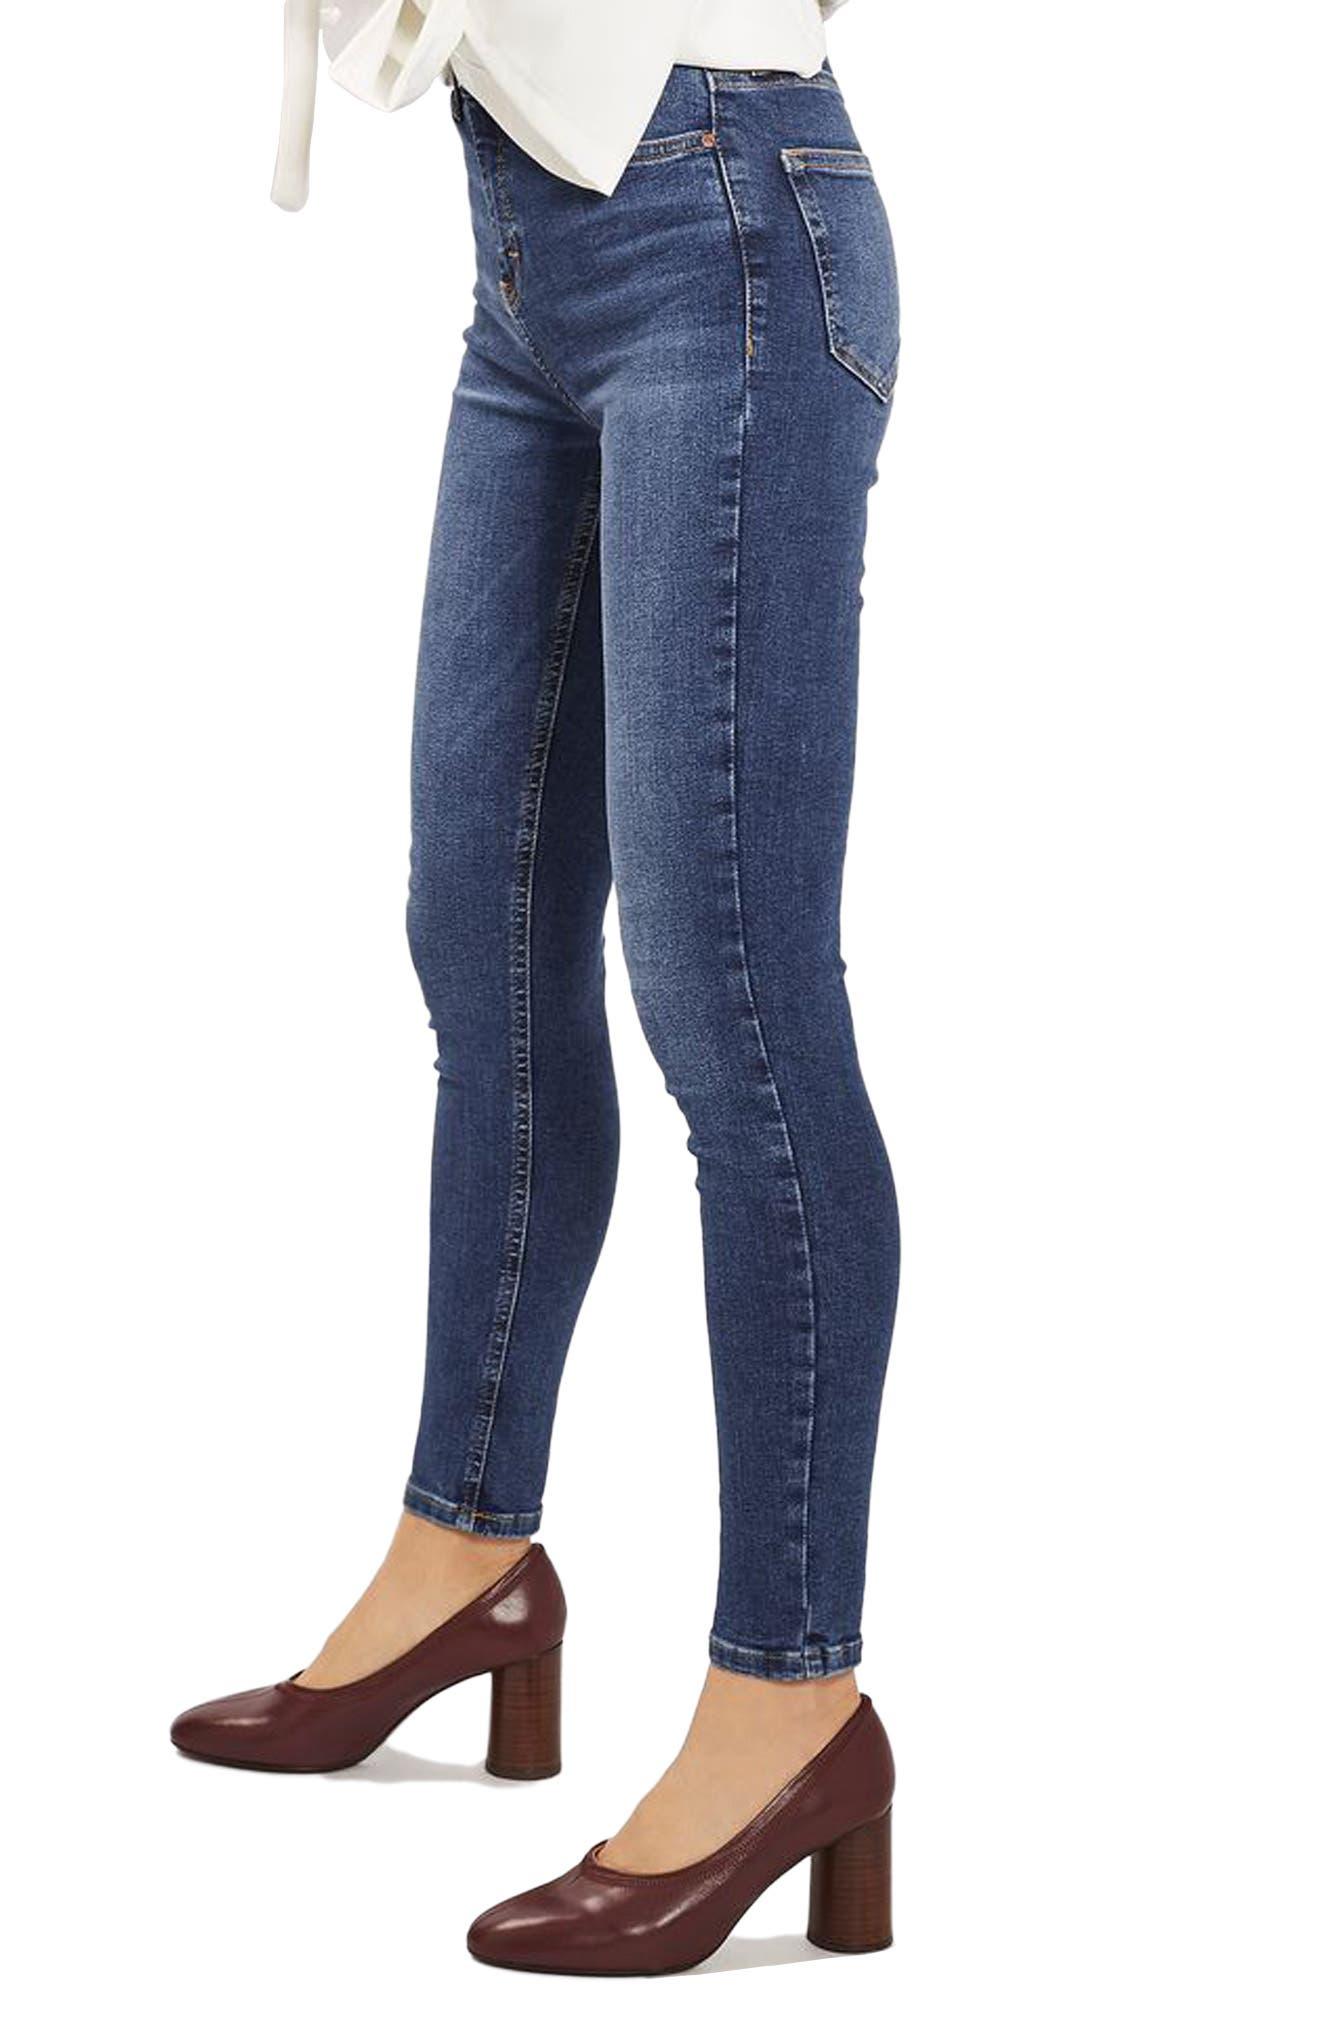 Main Image - Topshop Indigo High Waist Skinny Jeans